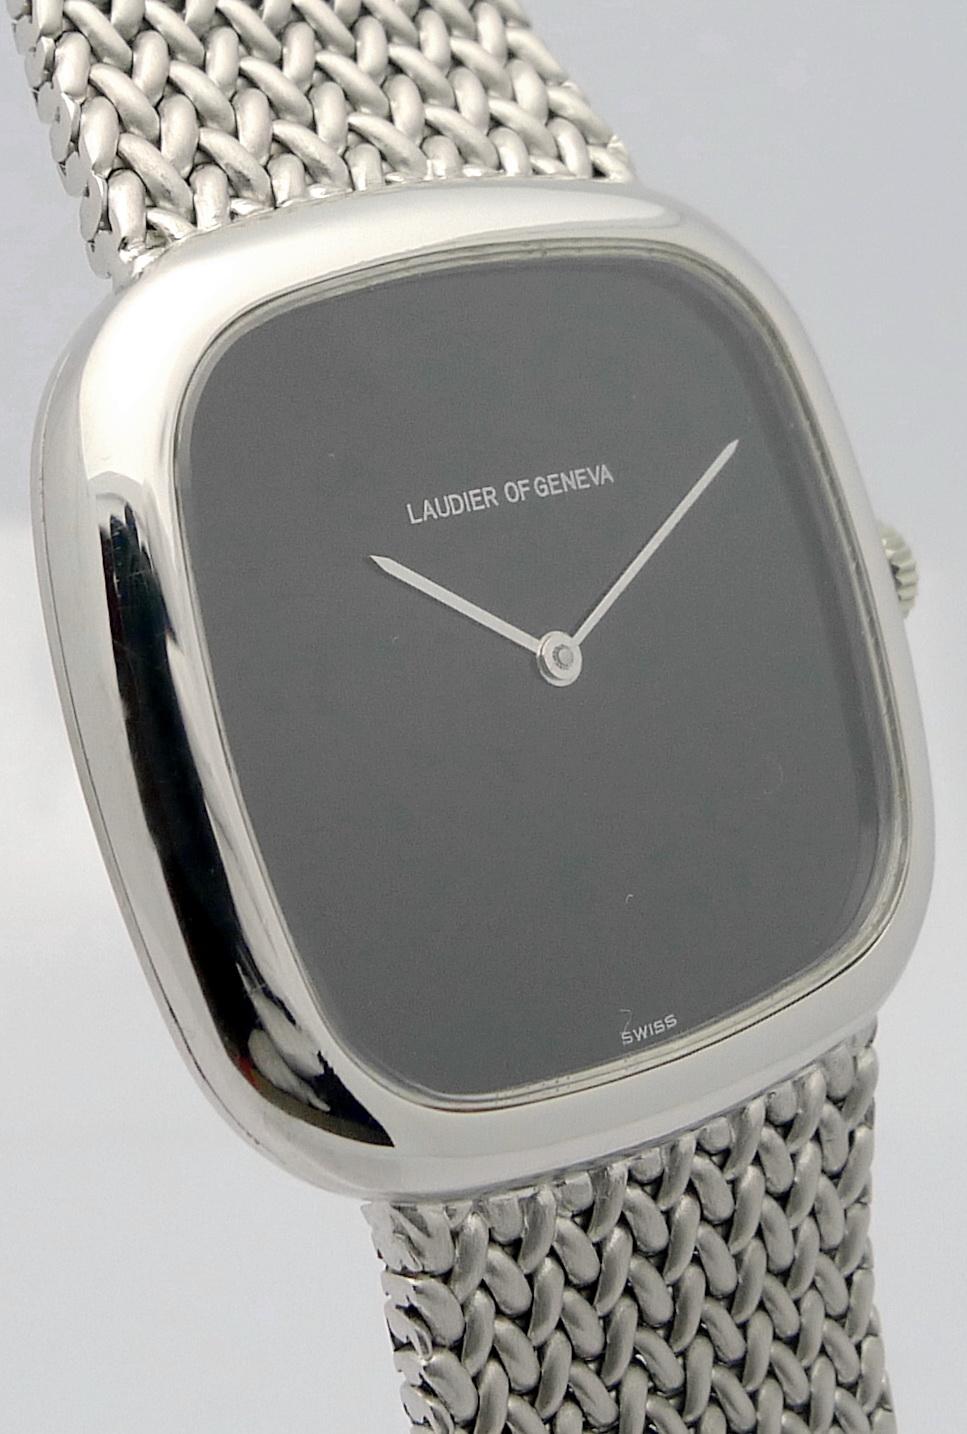 laudier geneve 18ct wei gold herren armbanduhr mit 18ct wei gold milanaiseband ebay. Black Bedroom Furniture Sets. Home Design Ideas